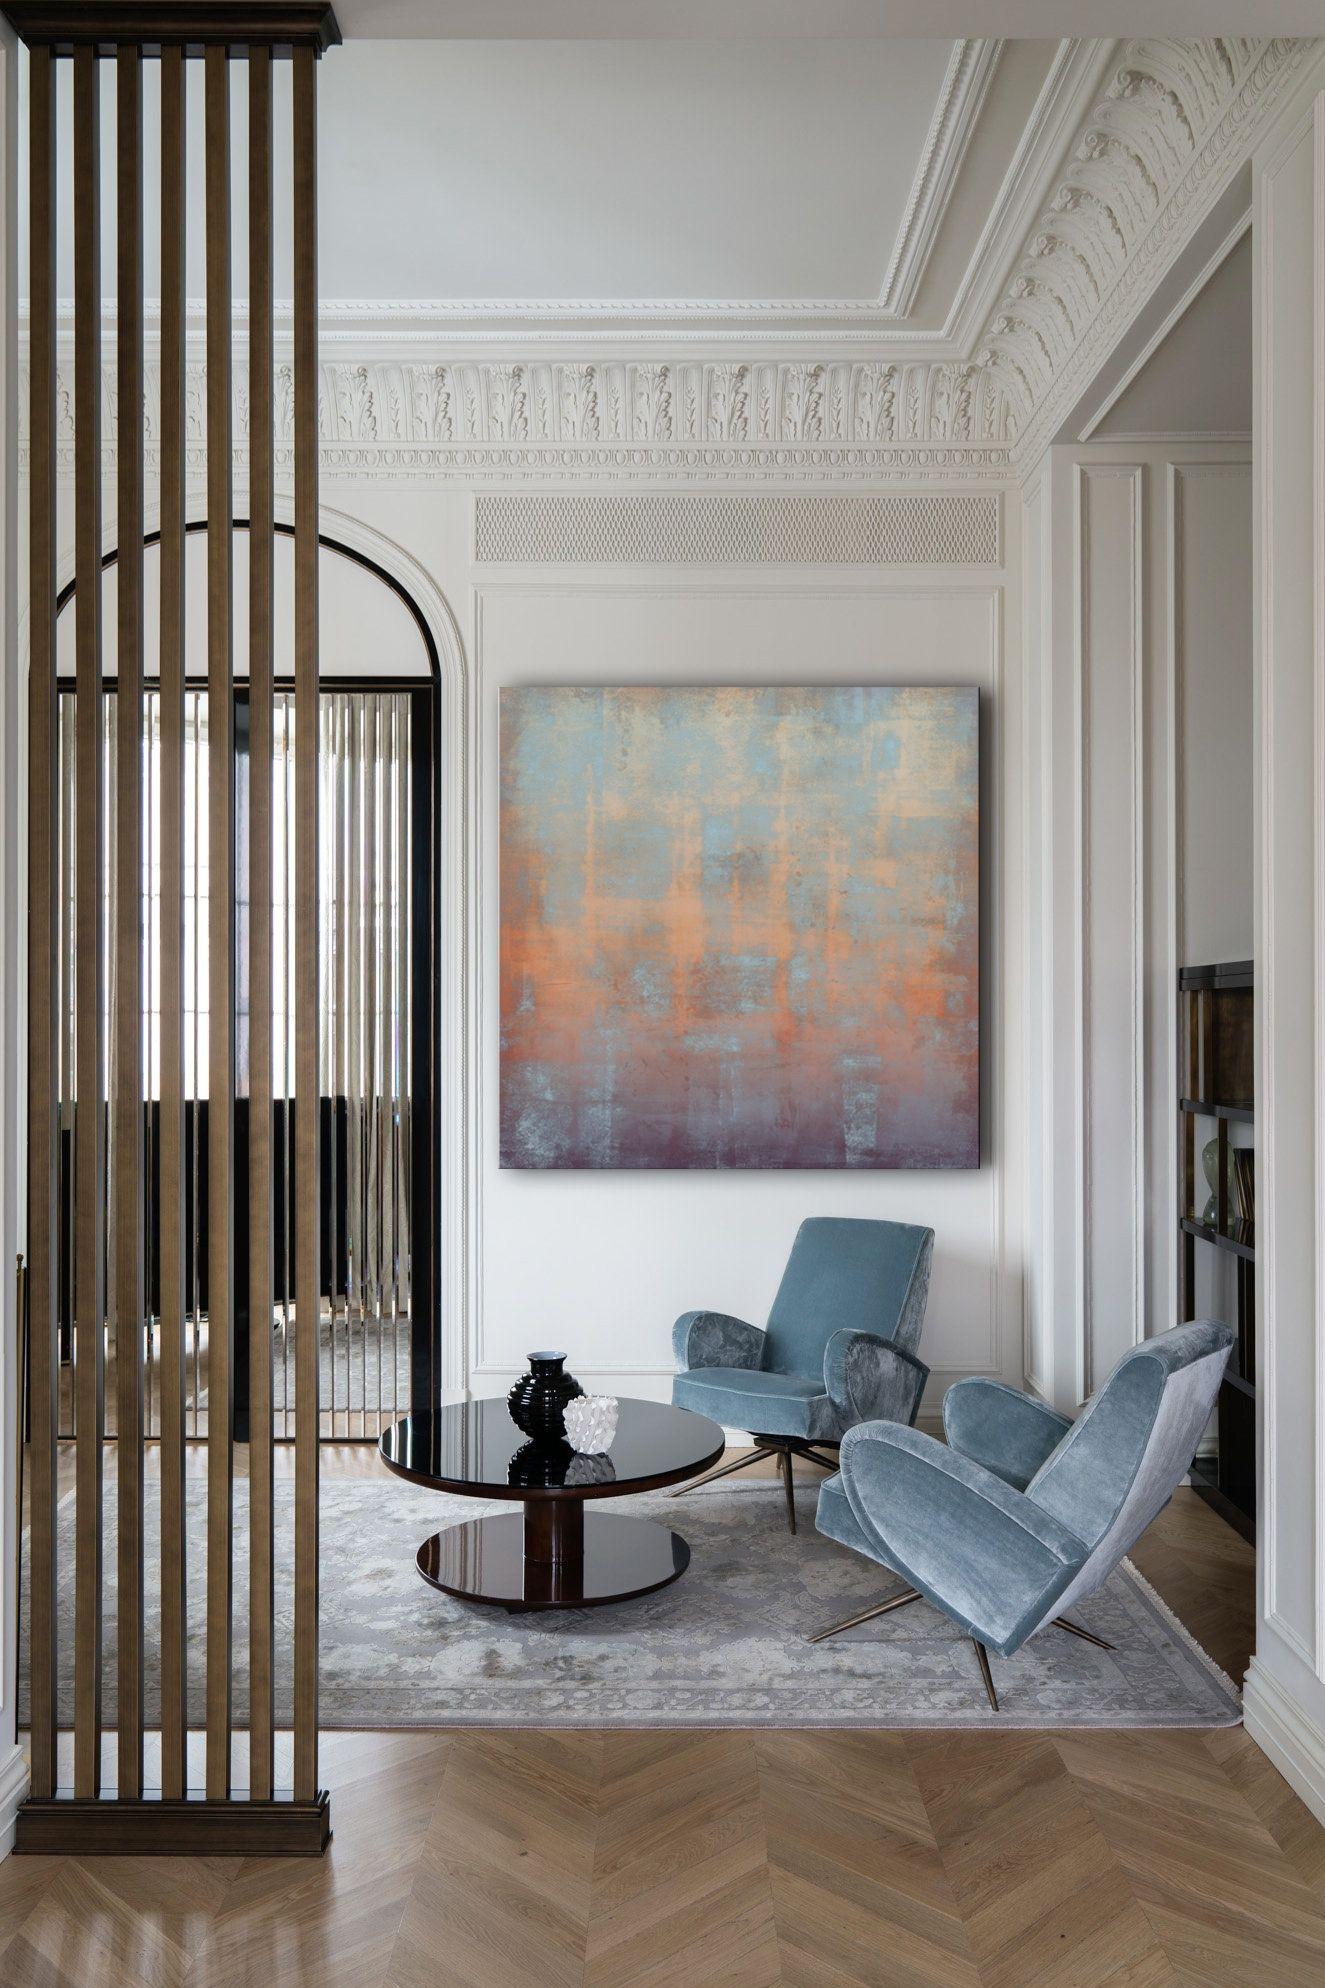 Rustic Abstract Painting Large Canvas Art Print Decor Interior Design Interior Design Modern Interior Design